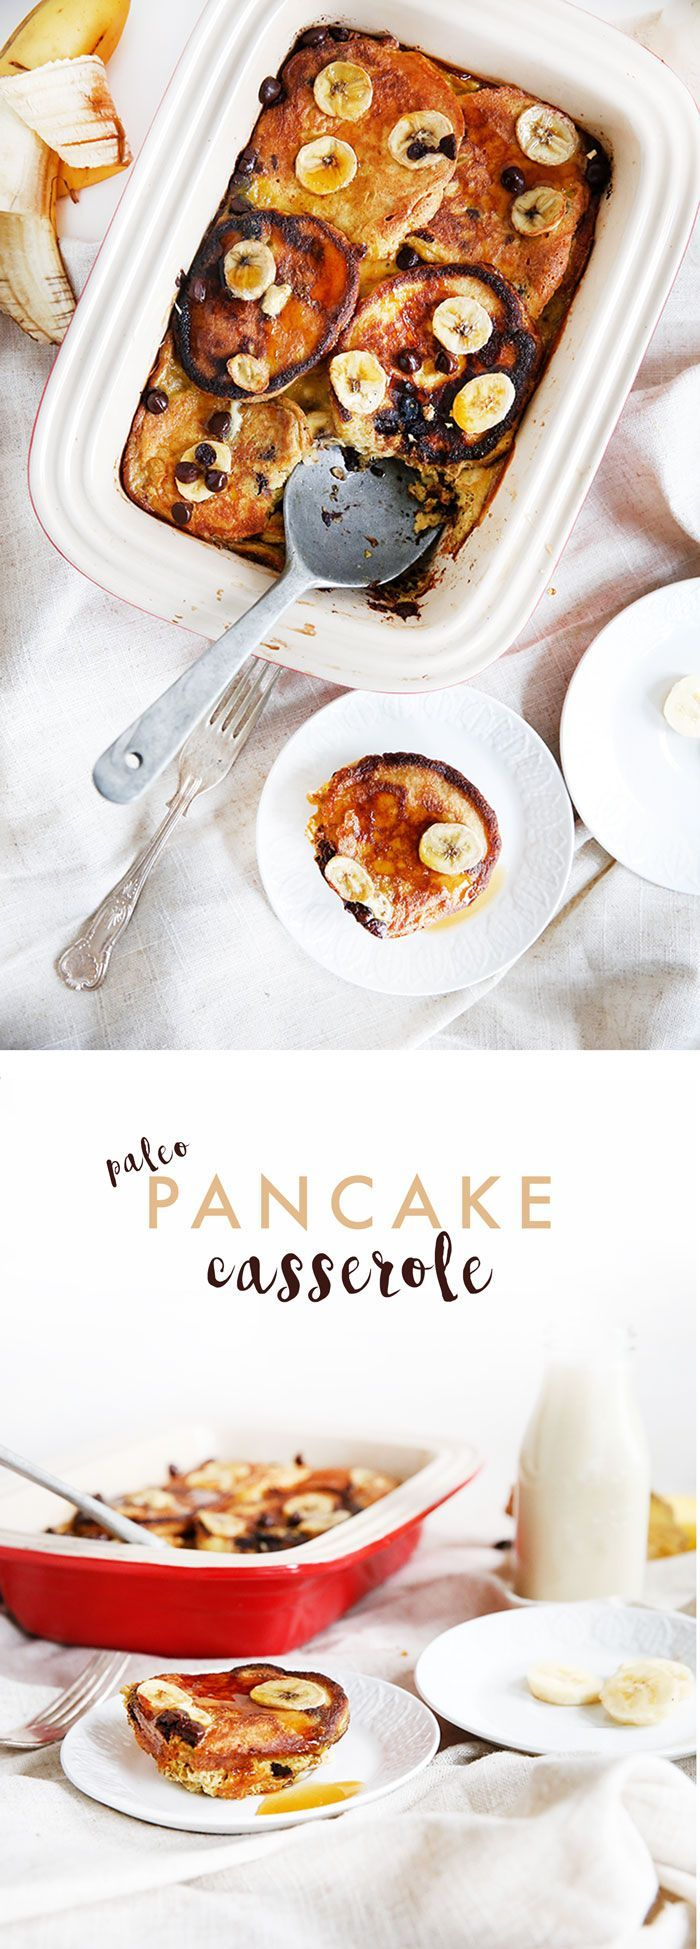 270 best PALEO RECIPES images on Pinterest | Appetizer recipes ...